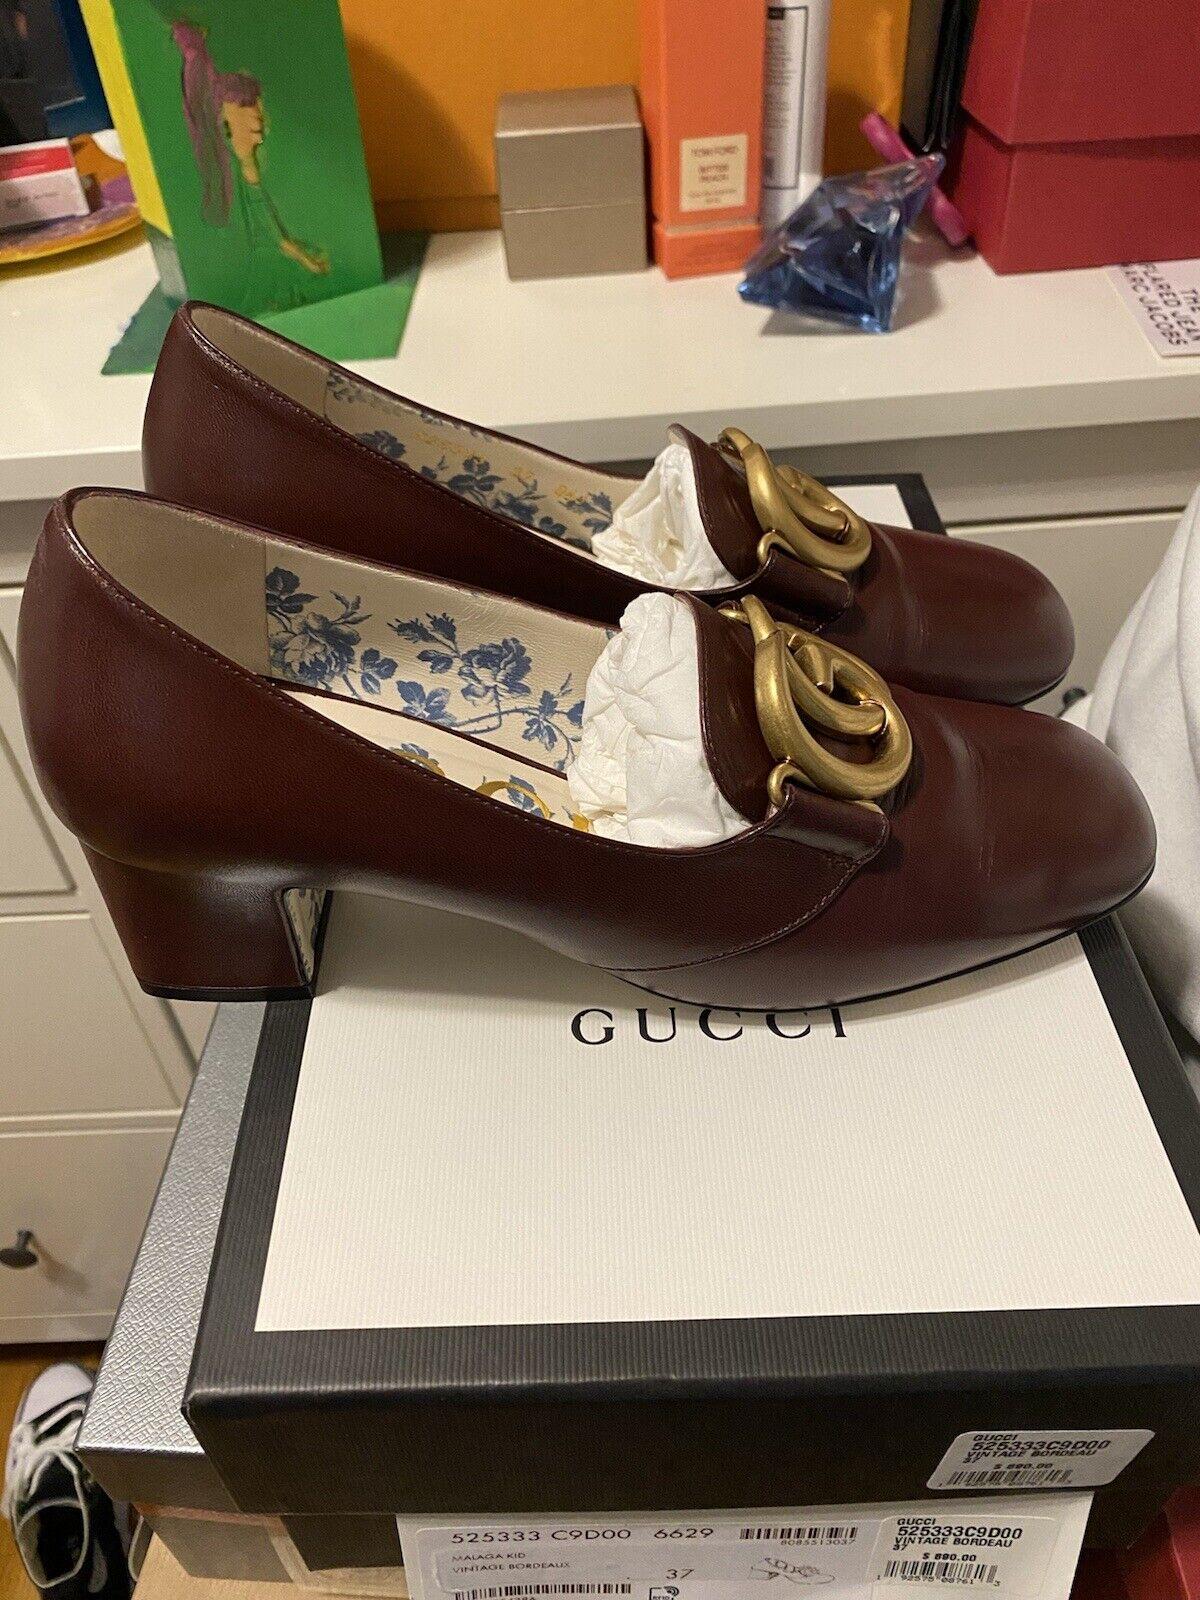 Gucci Malaga Kid Vintage Bordeaux heel loafer 37 … - image 2